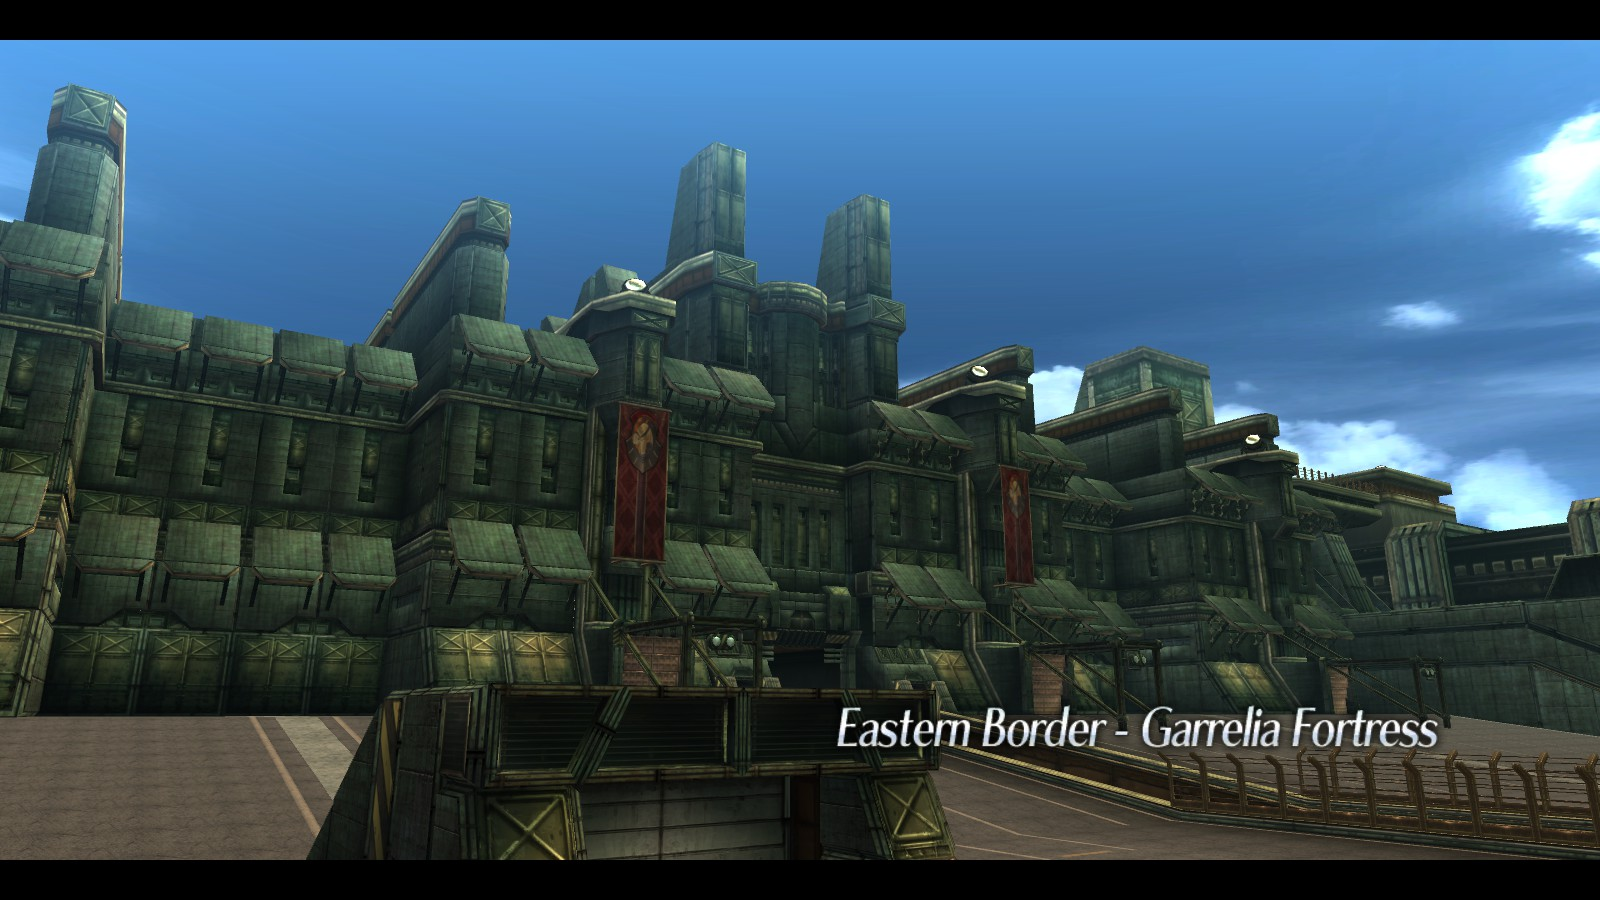 Garrelia Fortress